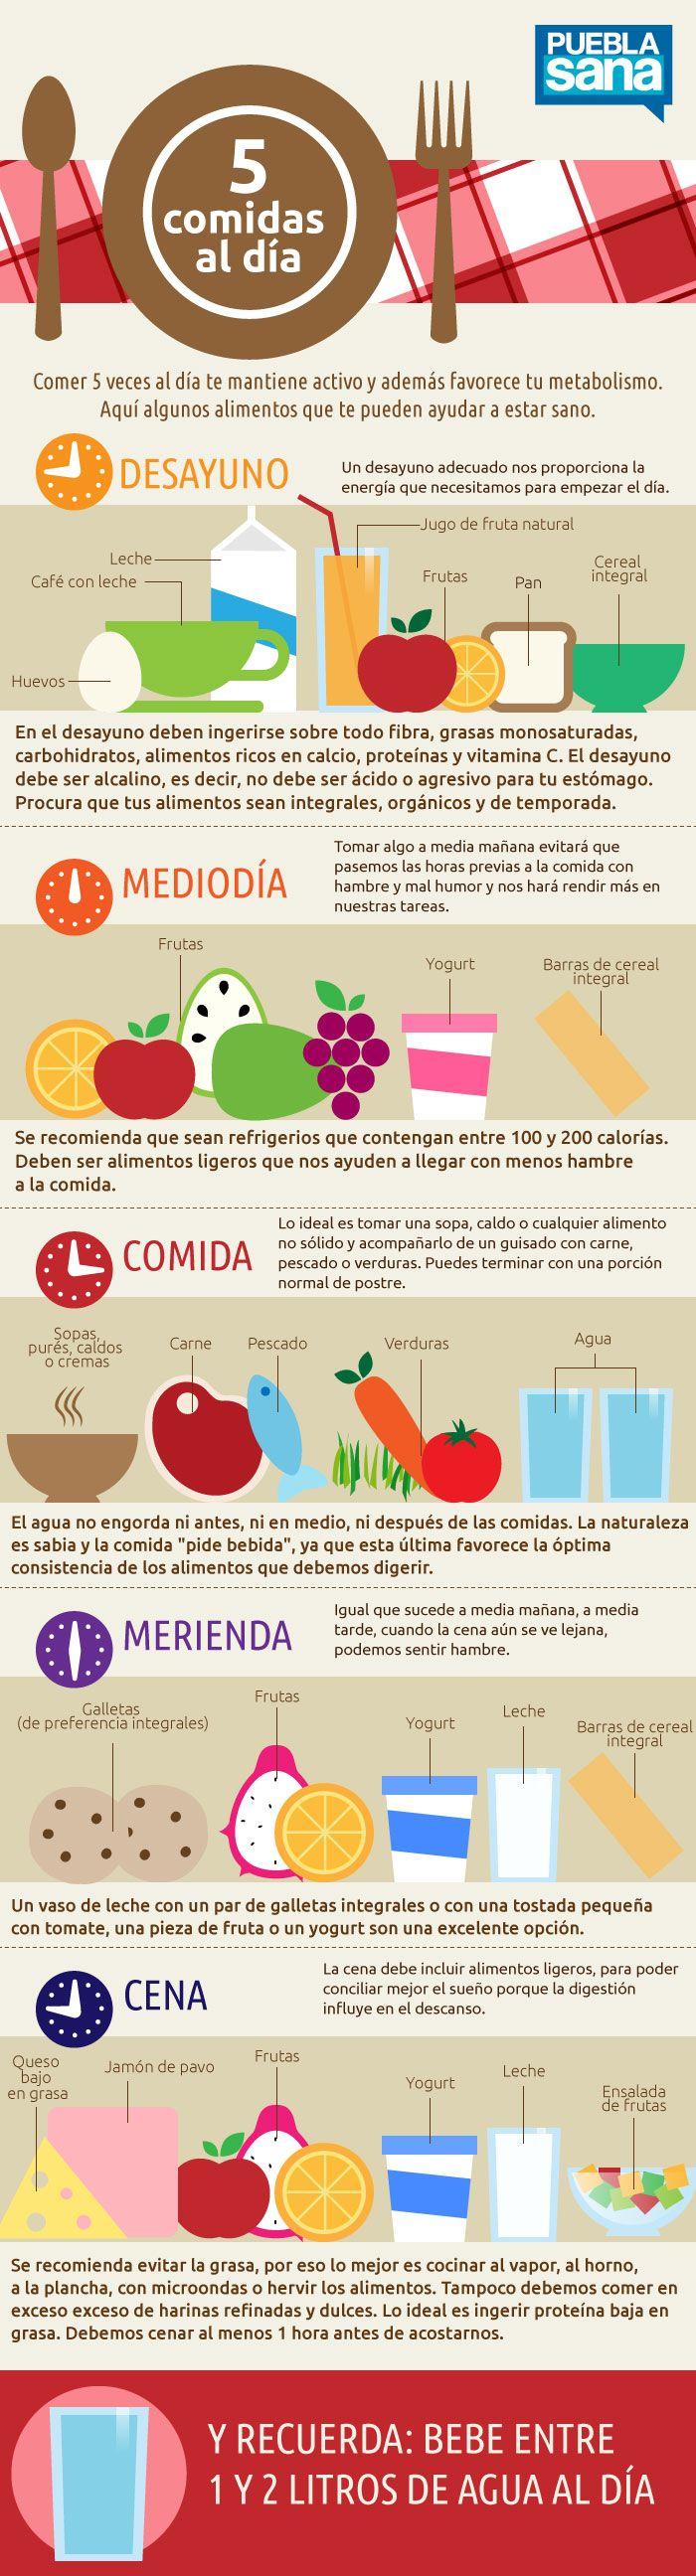 #adelgazamiento #superalimentos #dieta #nutritivo #salud #saludable #nutricion #alimentacion #infografia